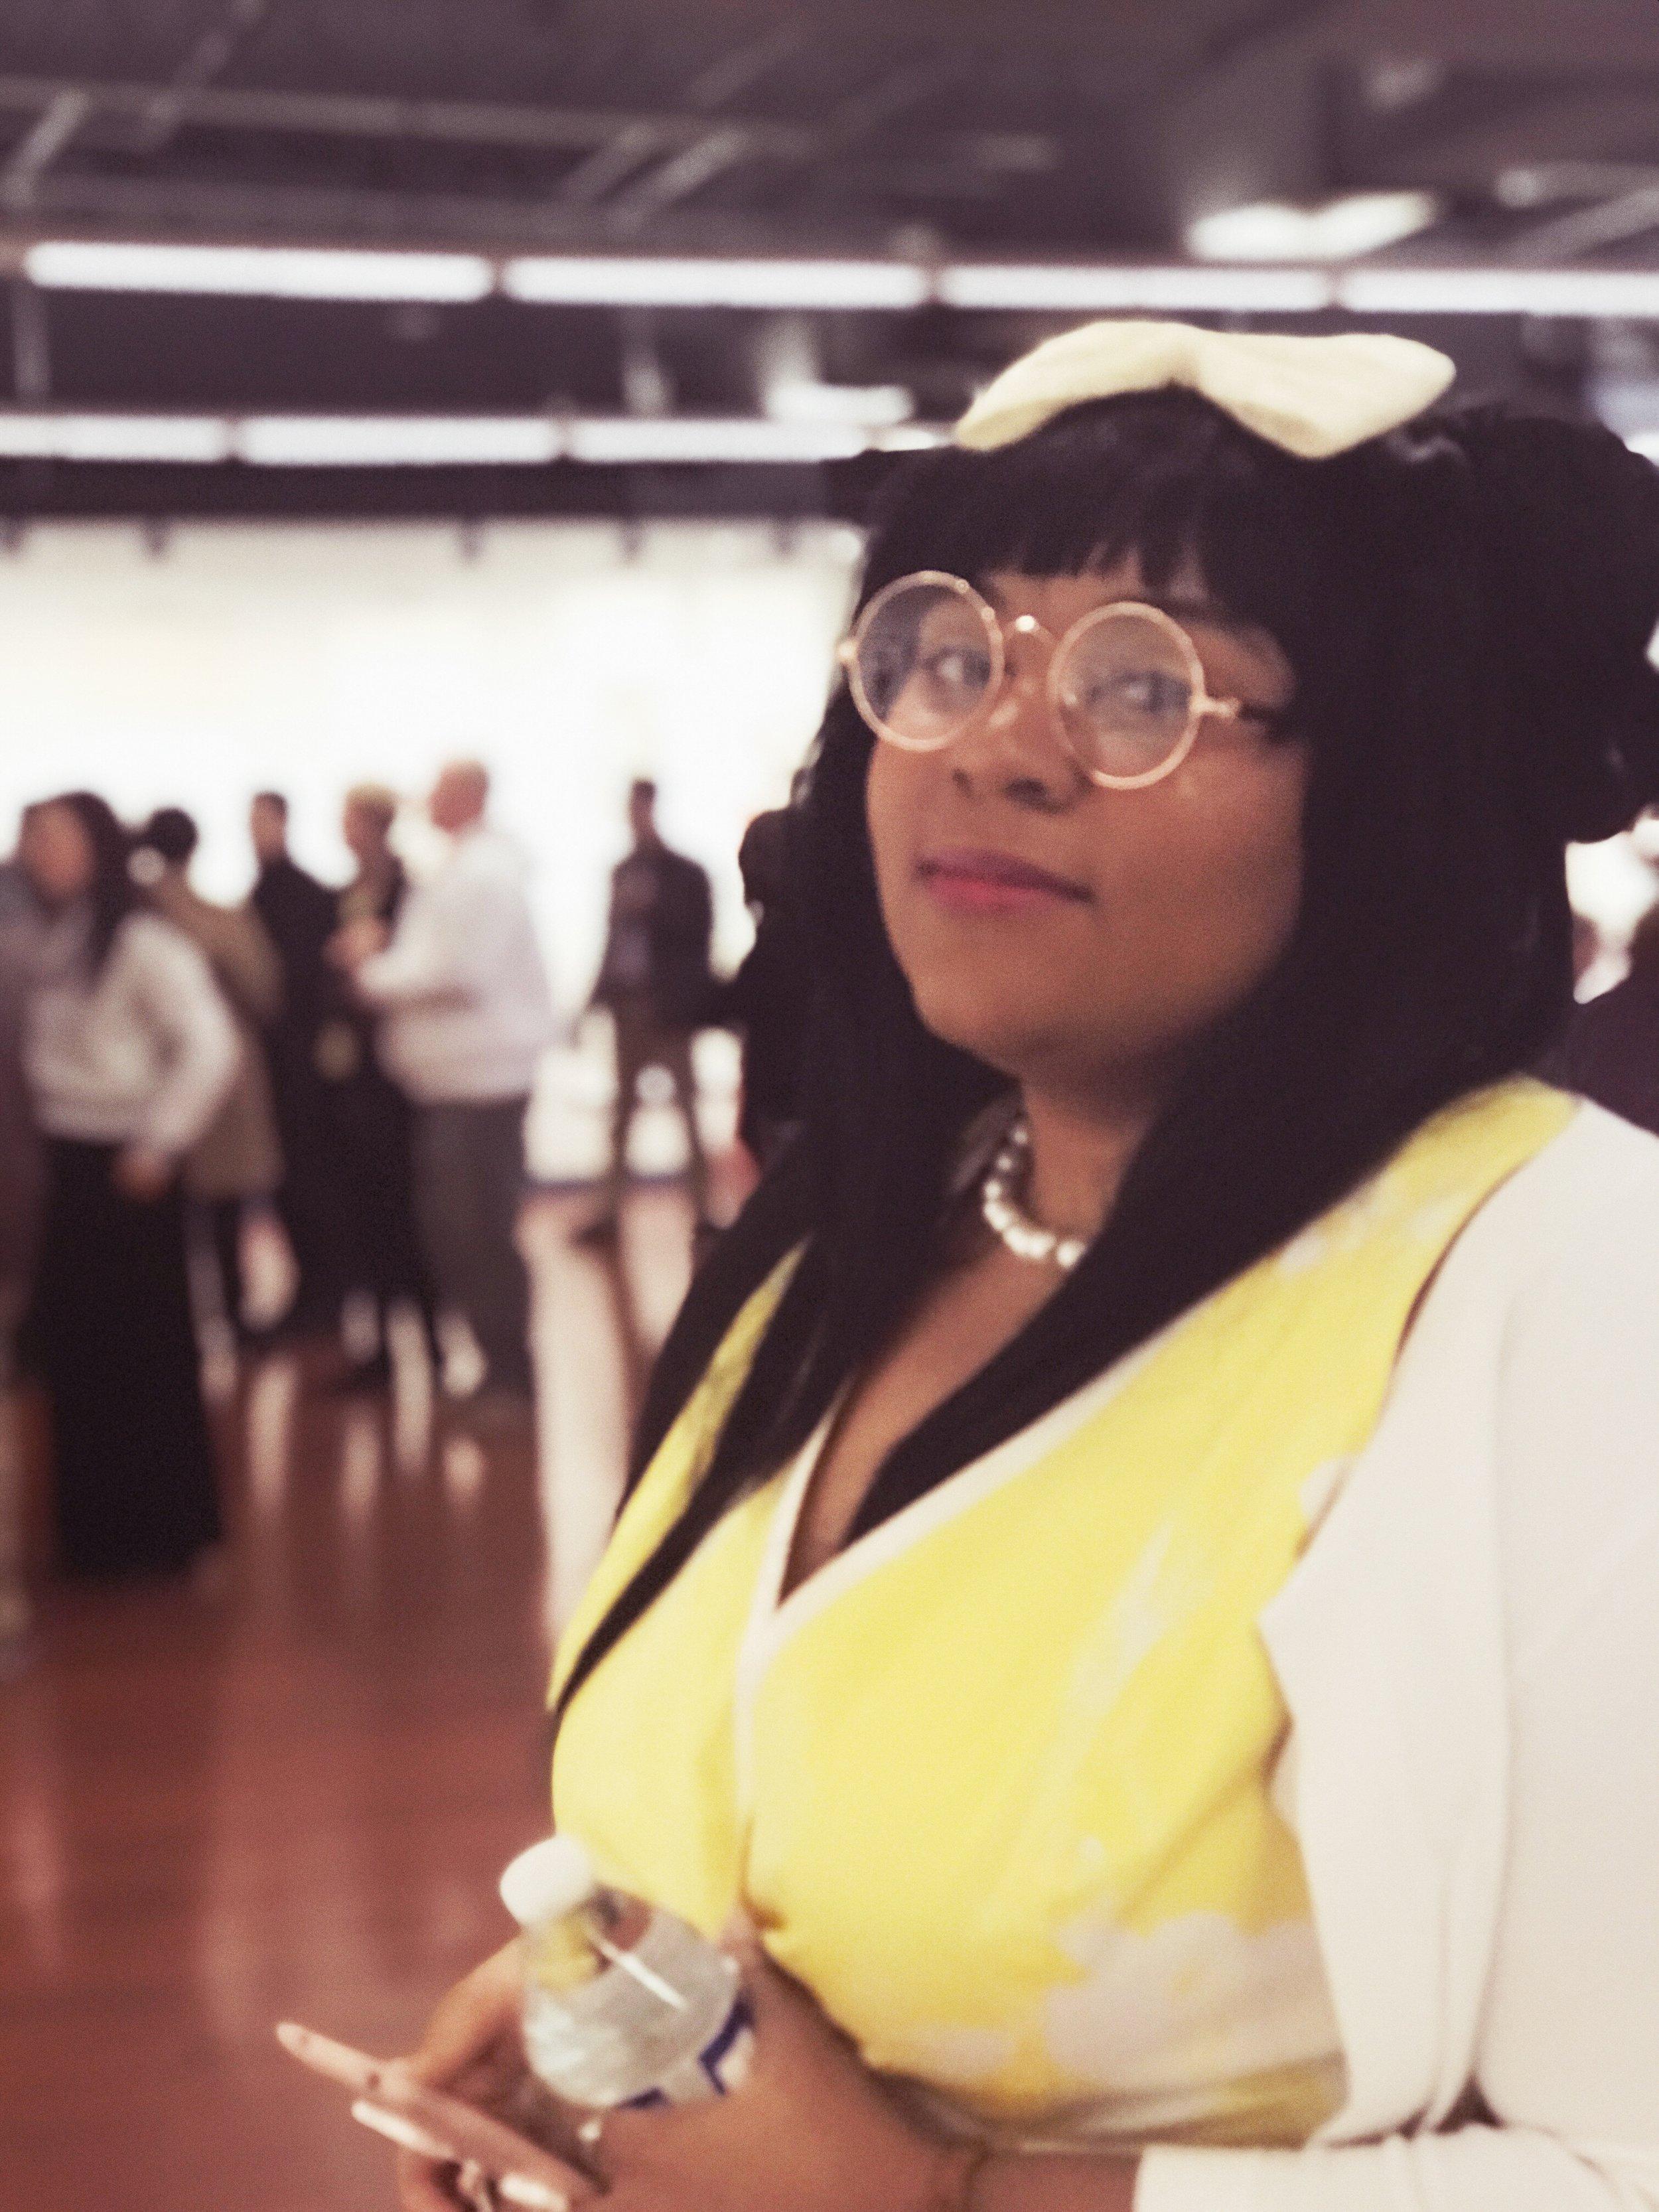 Magical Girl meets Art Exhibit